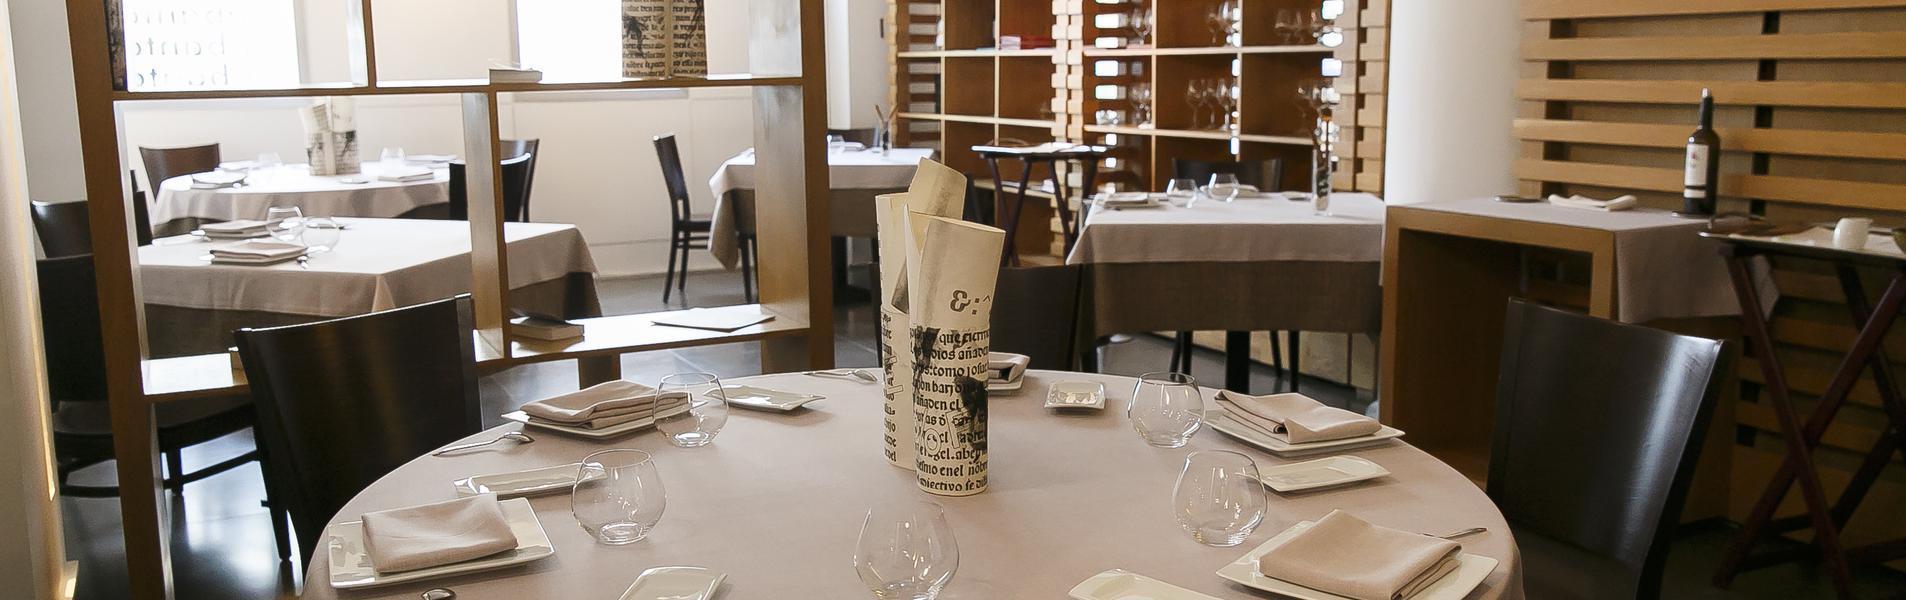 Restaurante Cocina Creativa Madrid